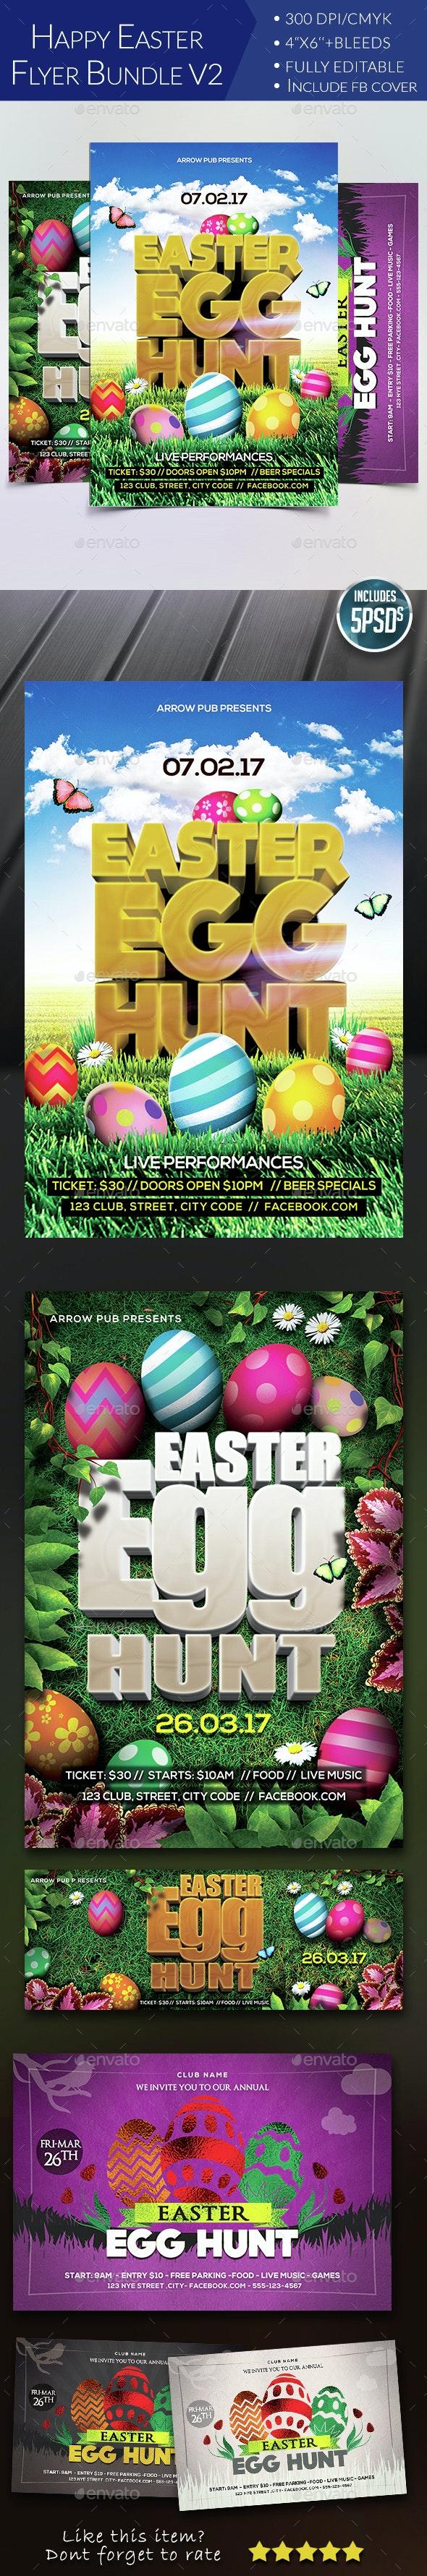 Easter Flyer Bundle V2 - Clubs & Parties Events